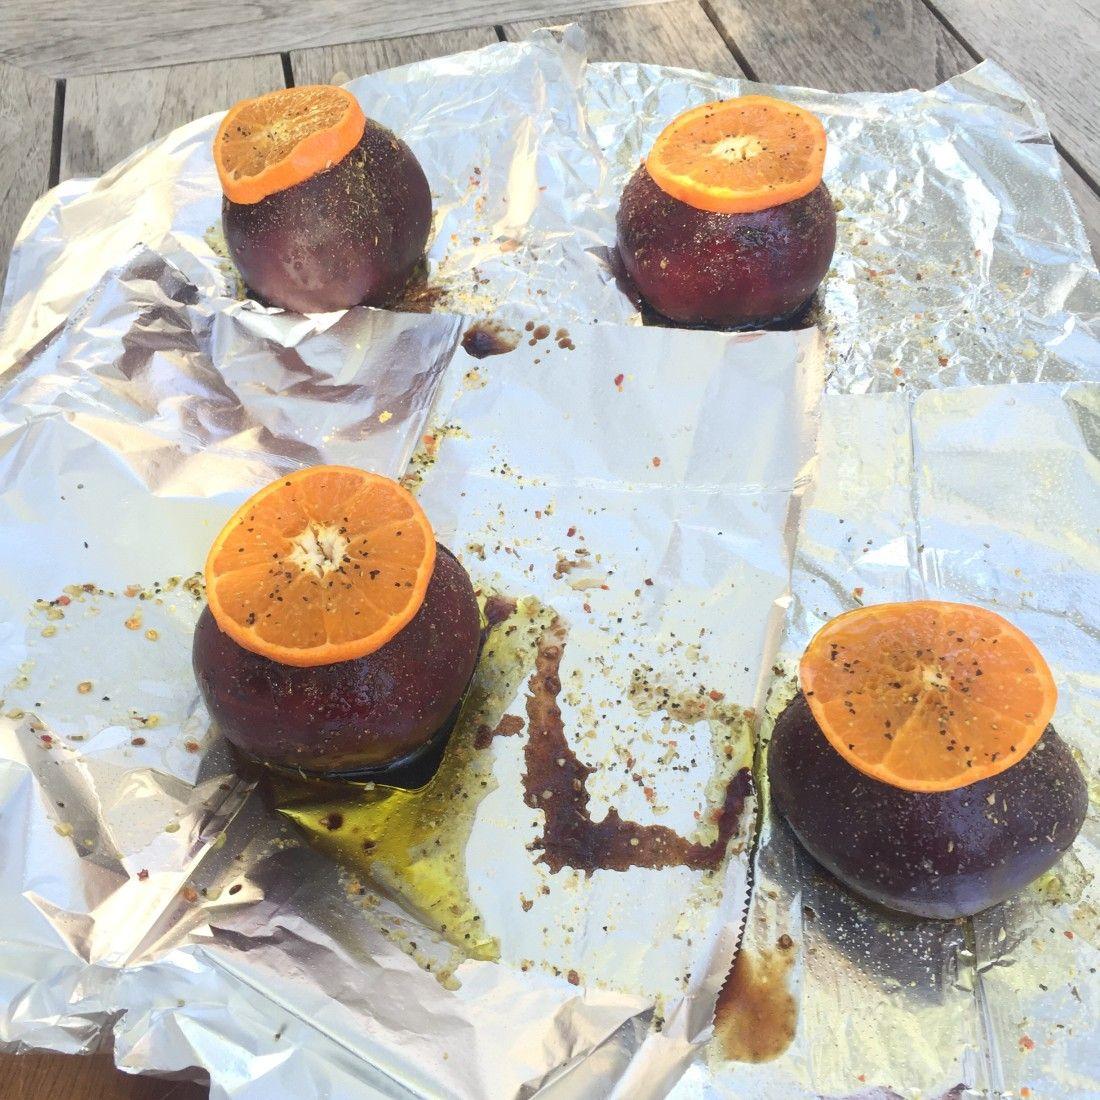 Betabeles asados/grilled beets. limg_3198.jpg